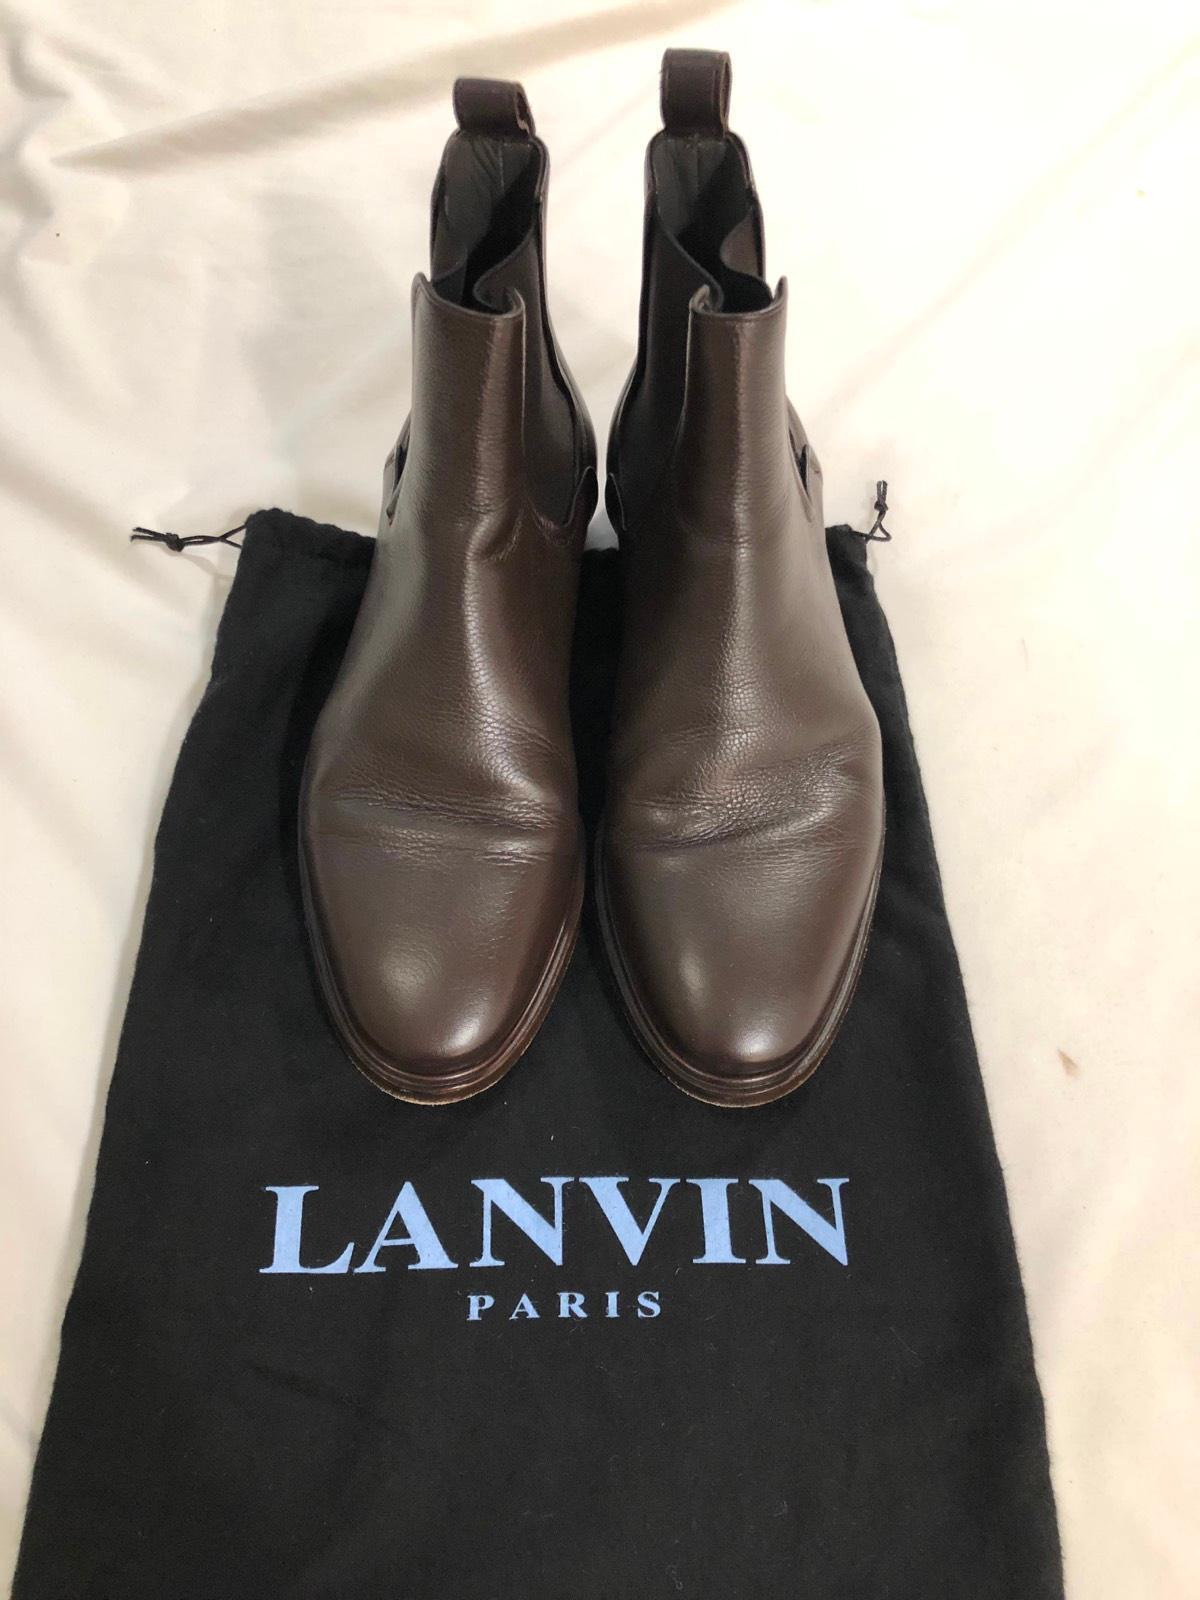 Lanvin Grained Leather Chelsea Stiefel UK 7, US 8, EU 41  1025